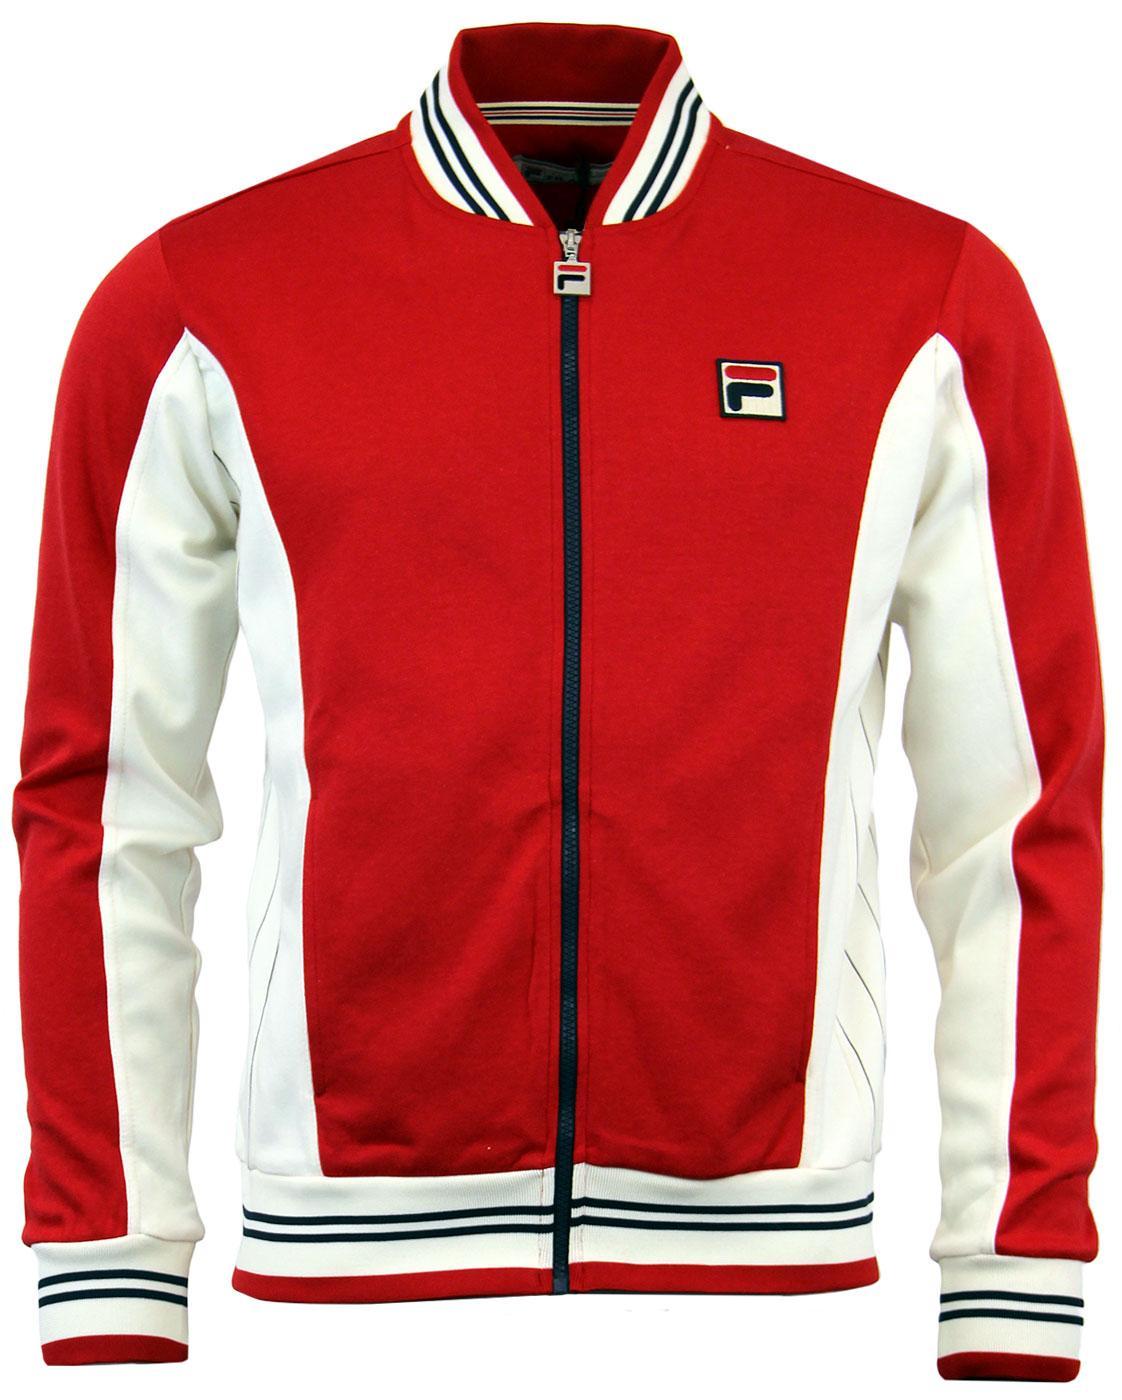 a3ad85a4dffb FILA VINTAGE Legends Settanta Retro 80s Borg Tennis Track Jacket